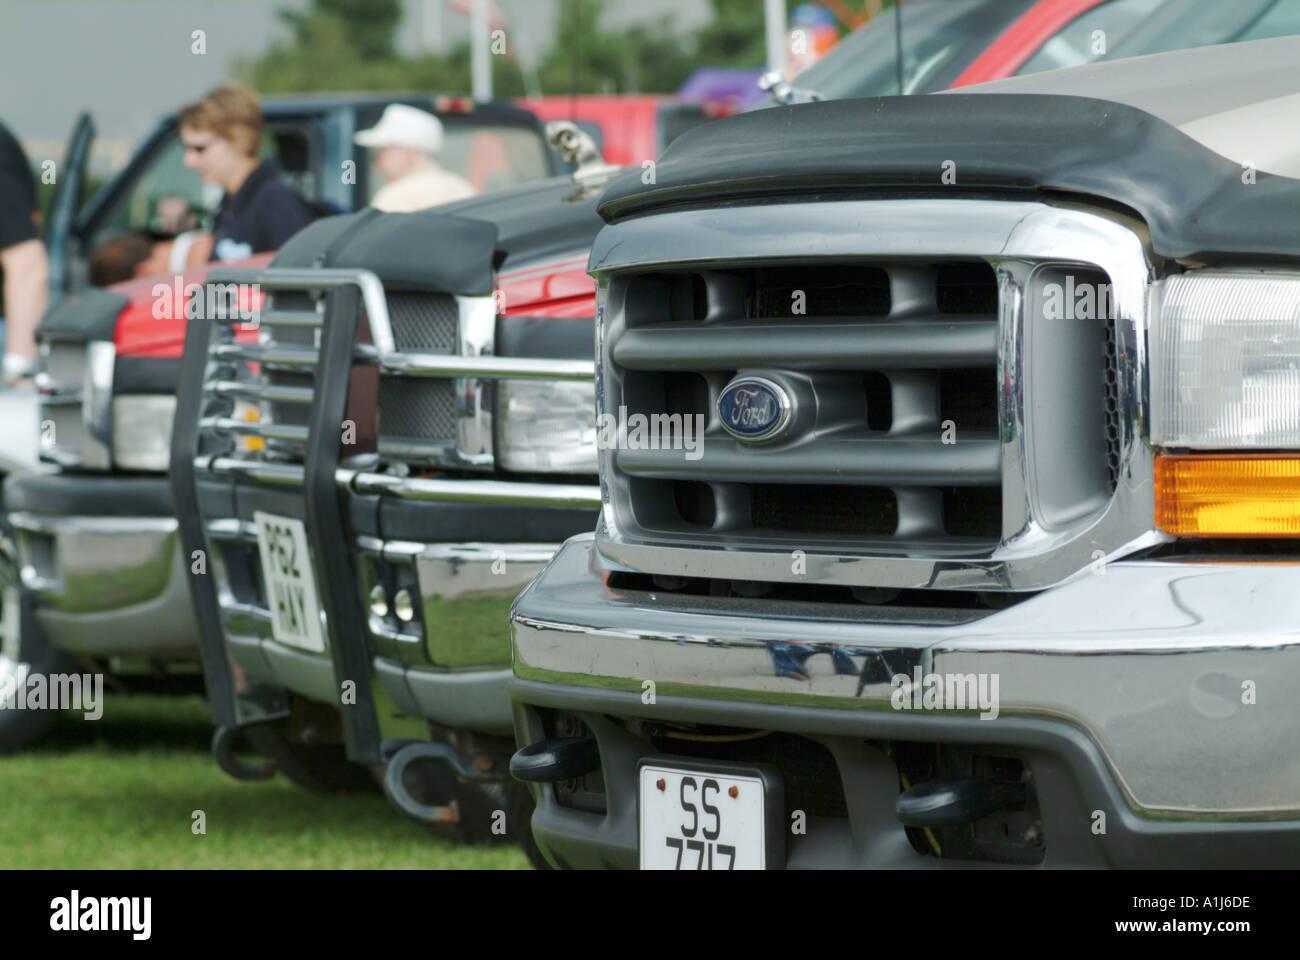 Ford Pick Up Truck Grill Car Gas Guzzler Petrol Suv Engine